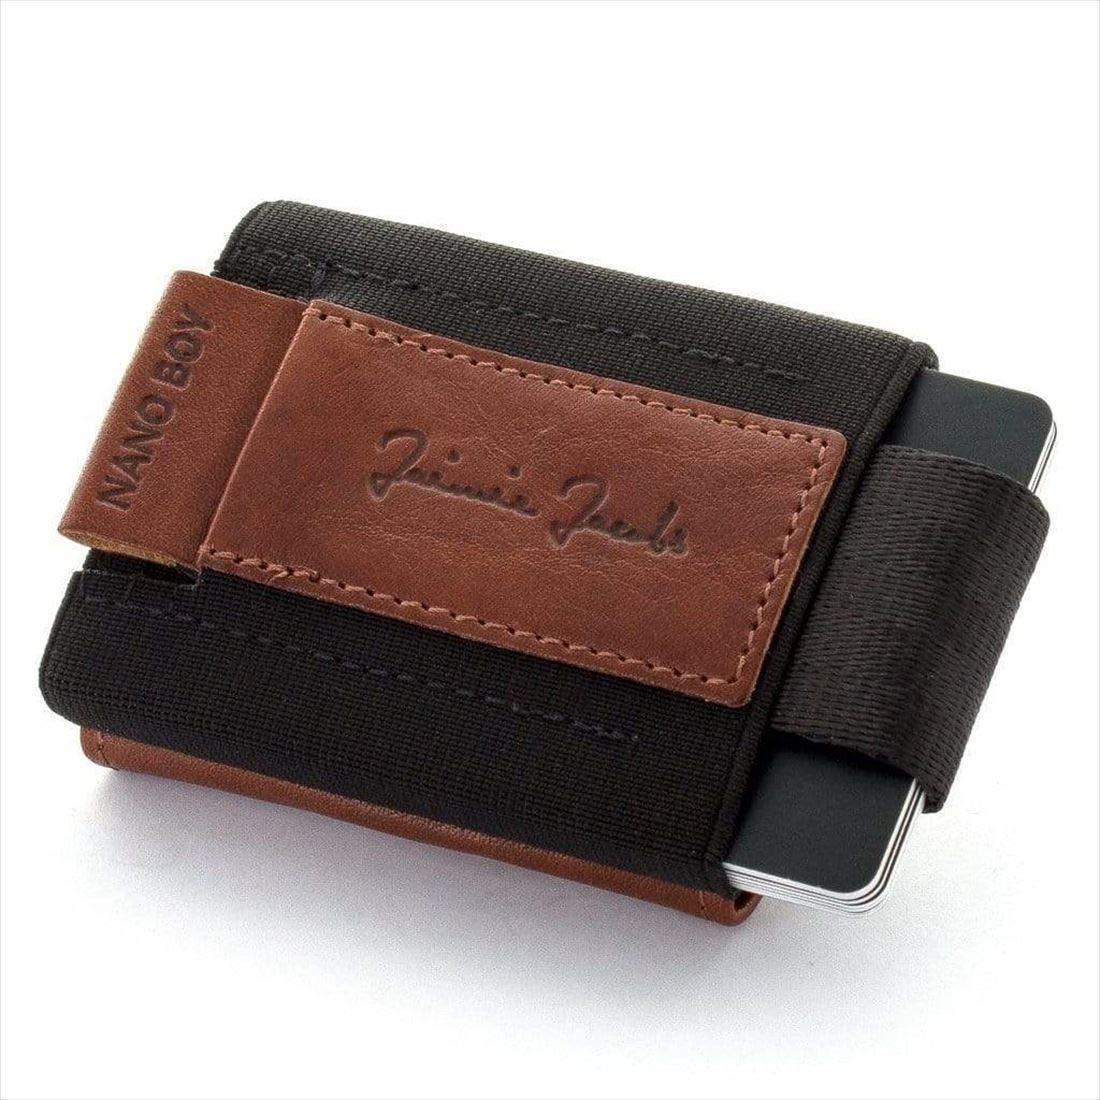 Jaimie Jacobs NANO BOY POCKET コンパクト財布 ( マネークリップ 小銭入れ カードケース ギフトボックス付き) ダークブラウン 正規輸入品